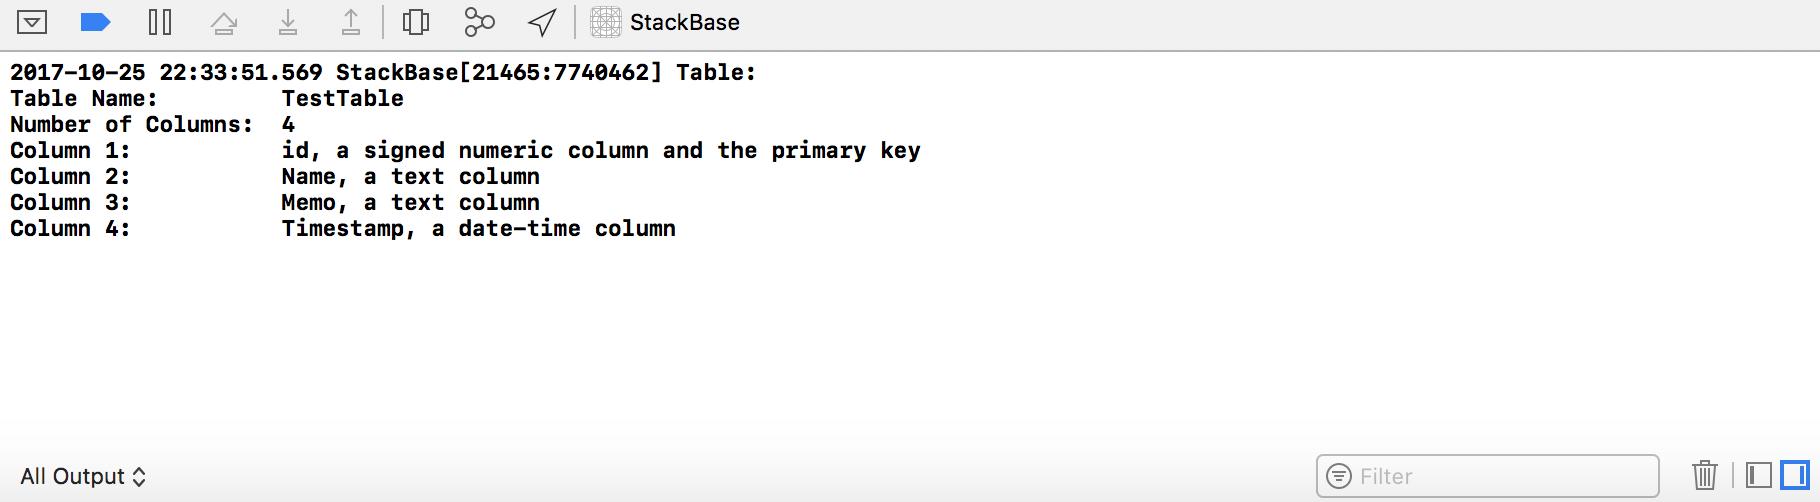 StackBase